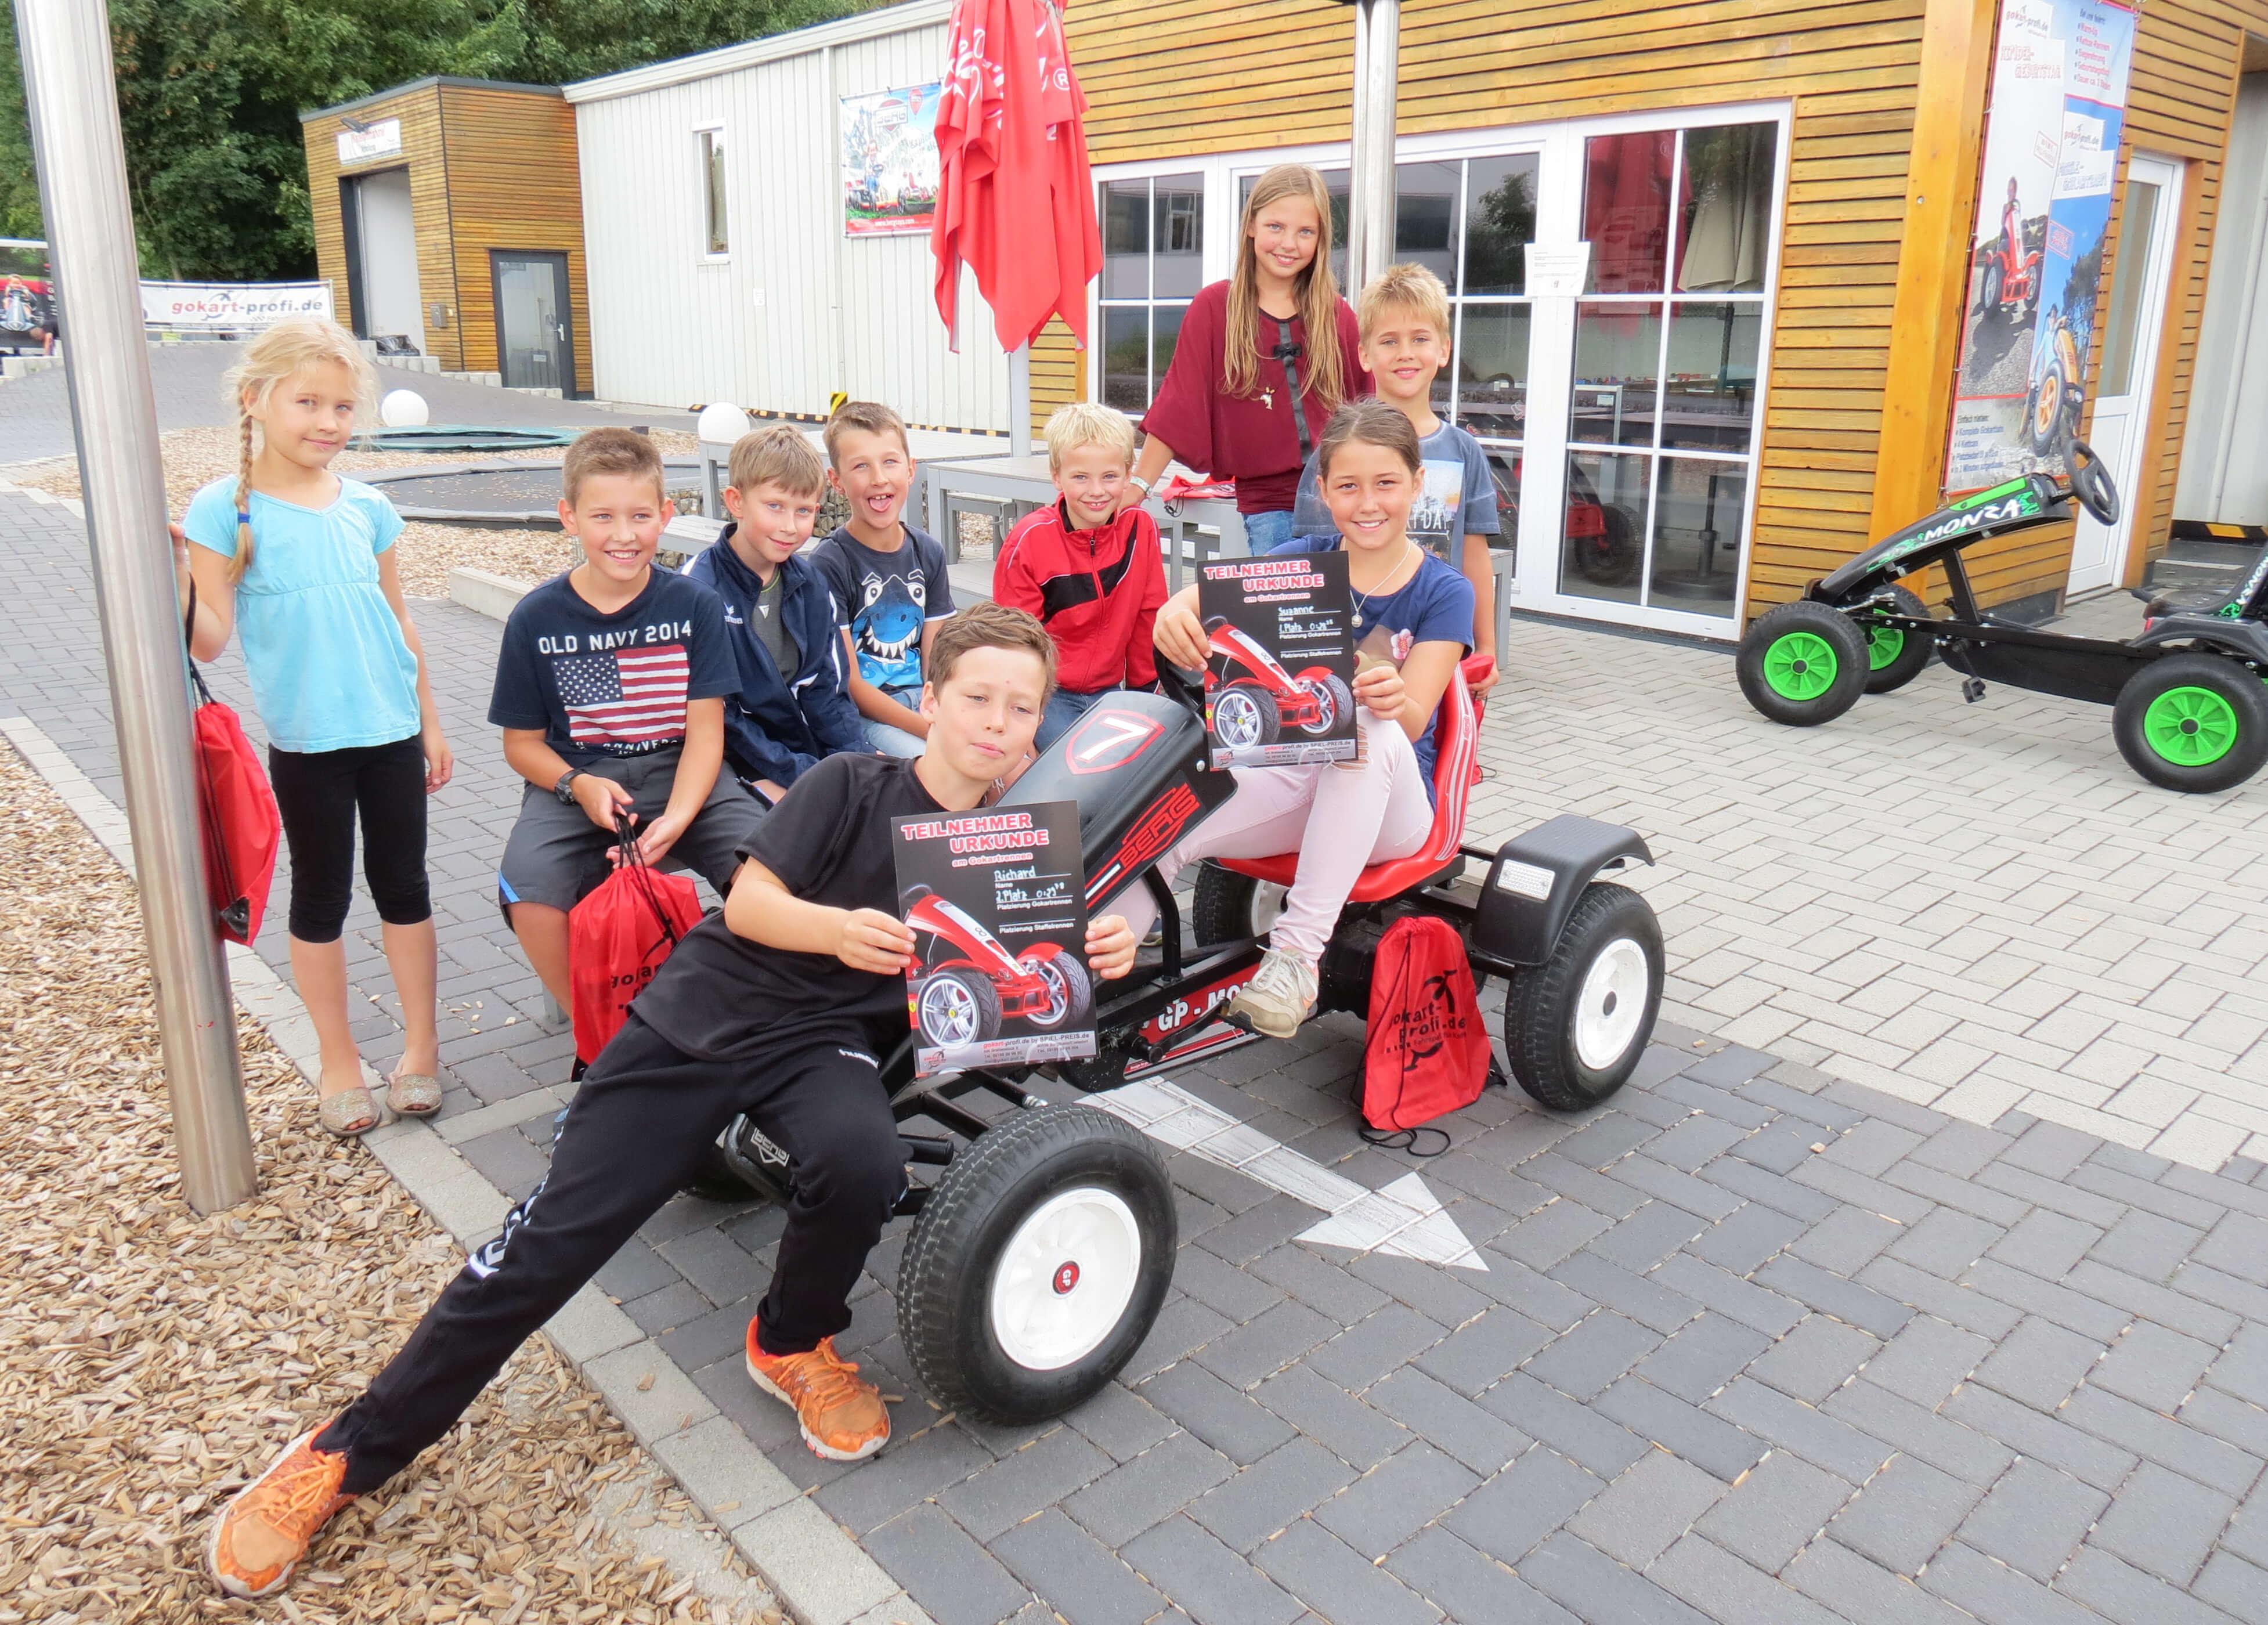 Ferienprogramm Schwarzenbruck 2018 bei gokart-profi.de vor Ort